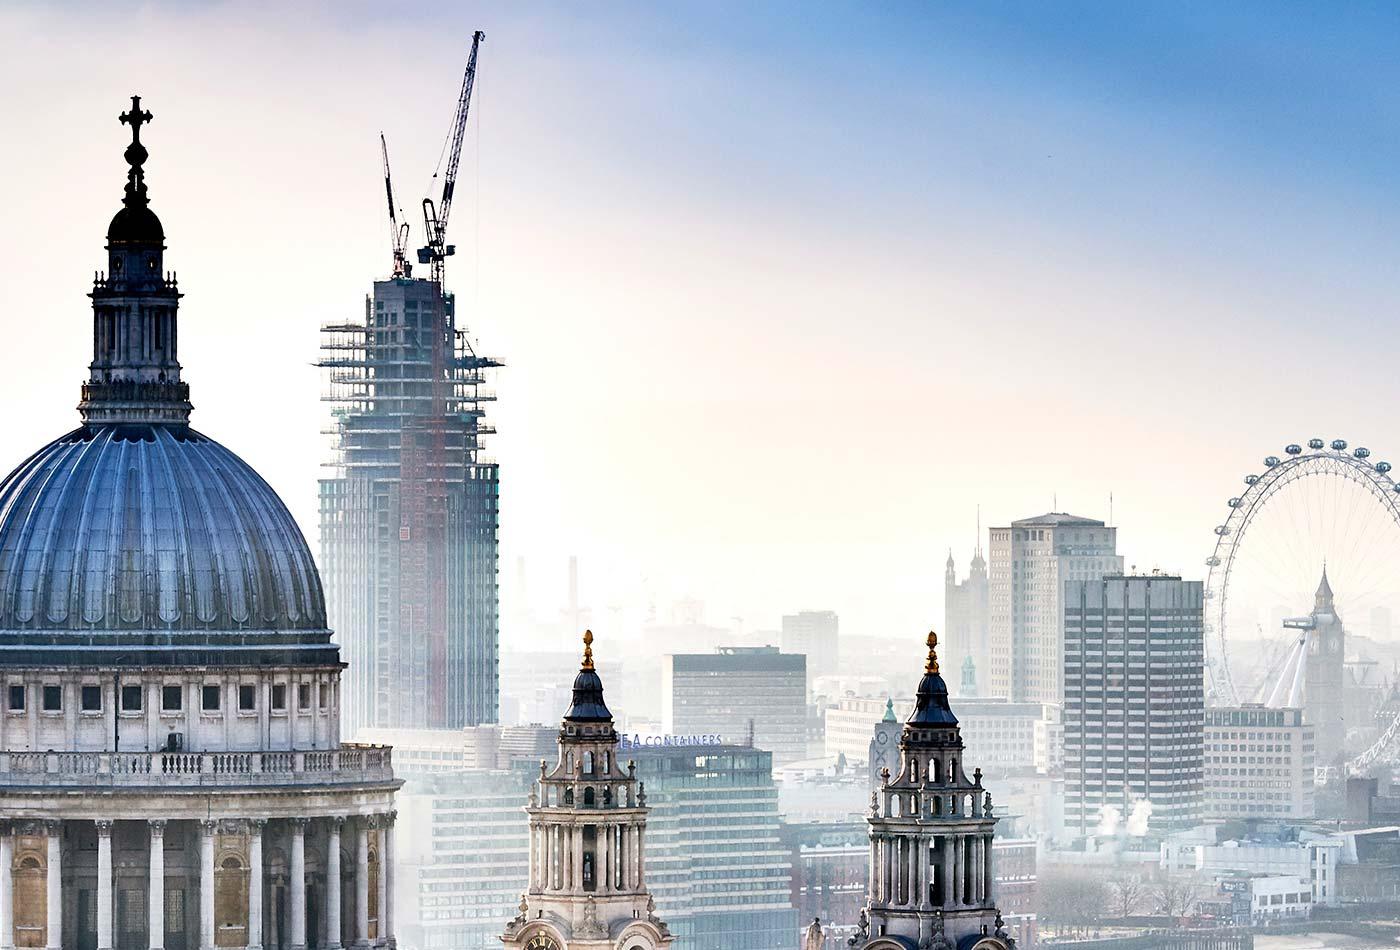 London skyline - Strata London 2019